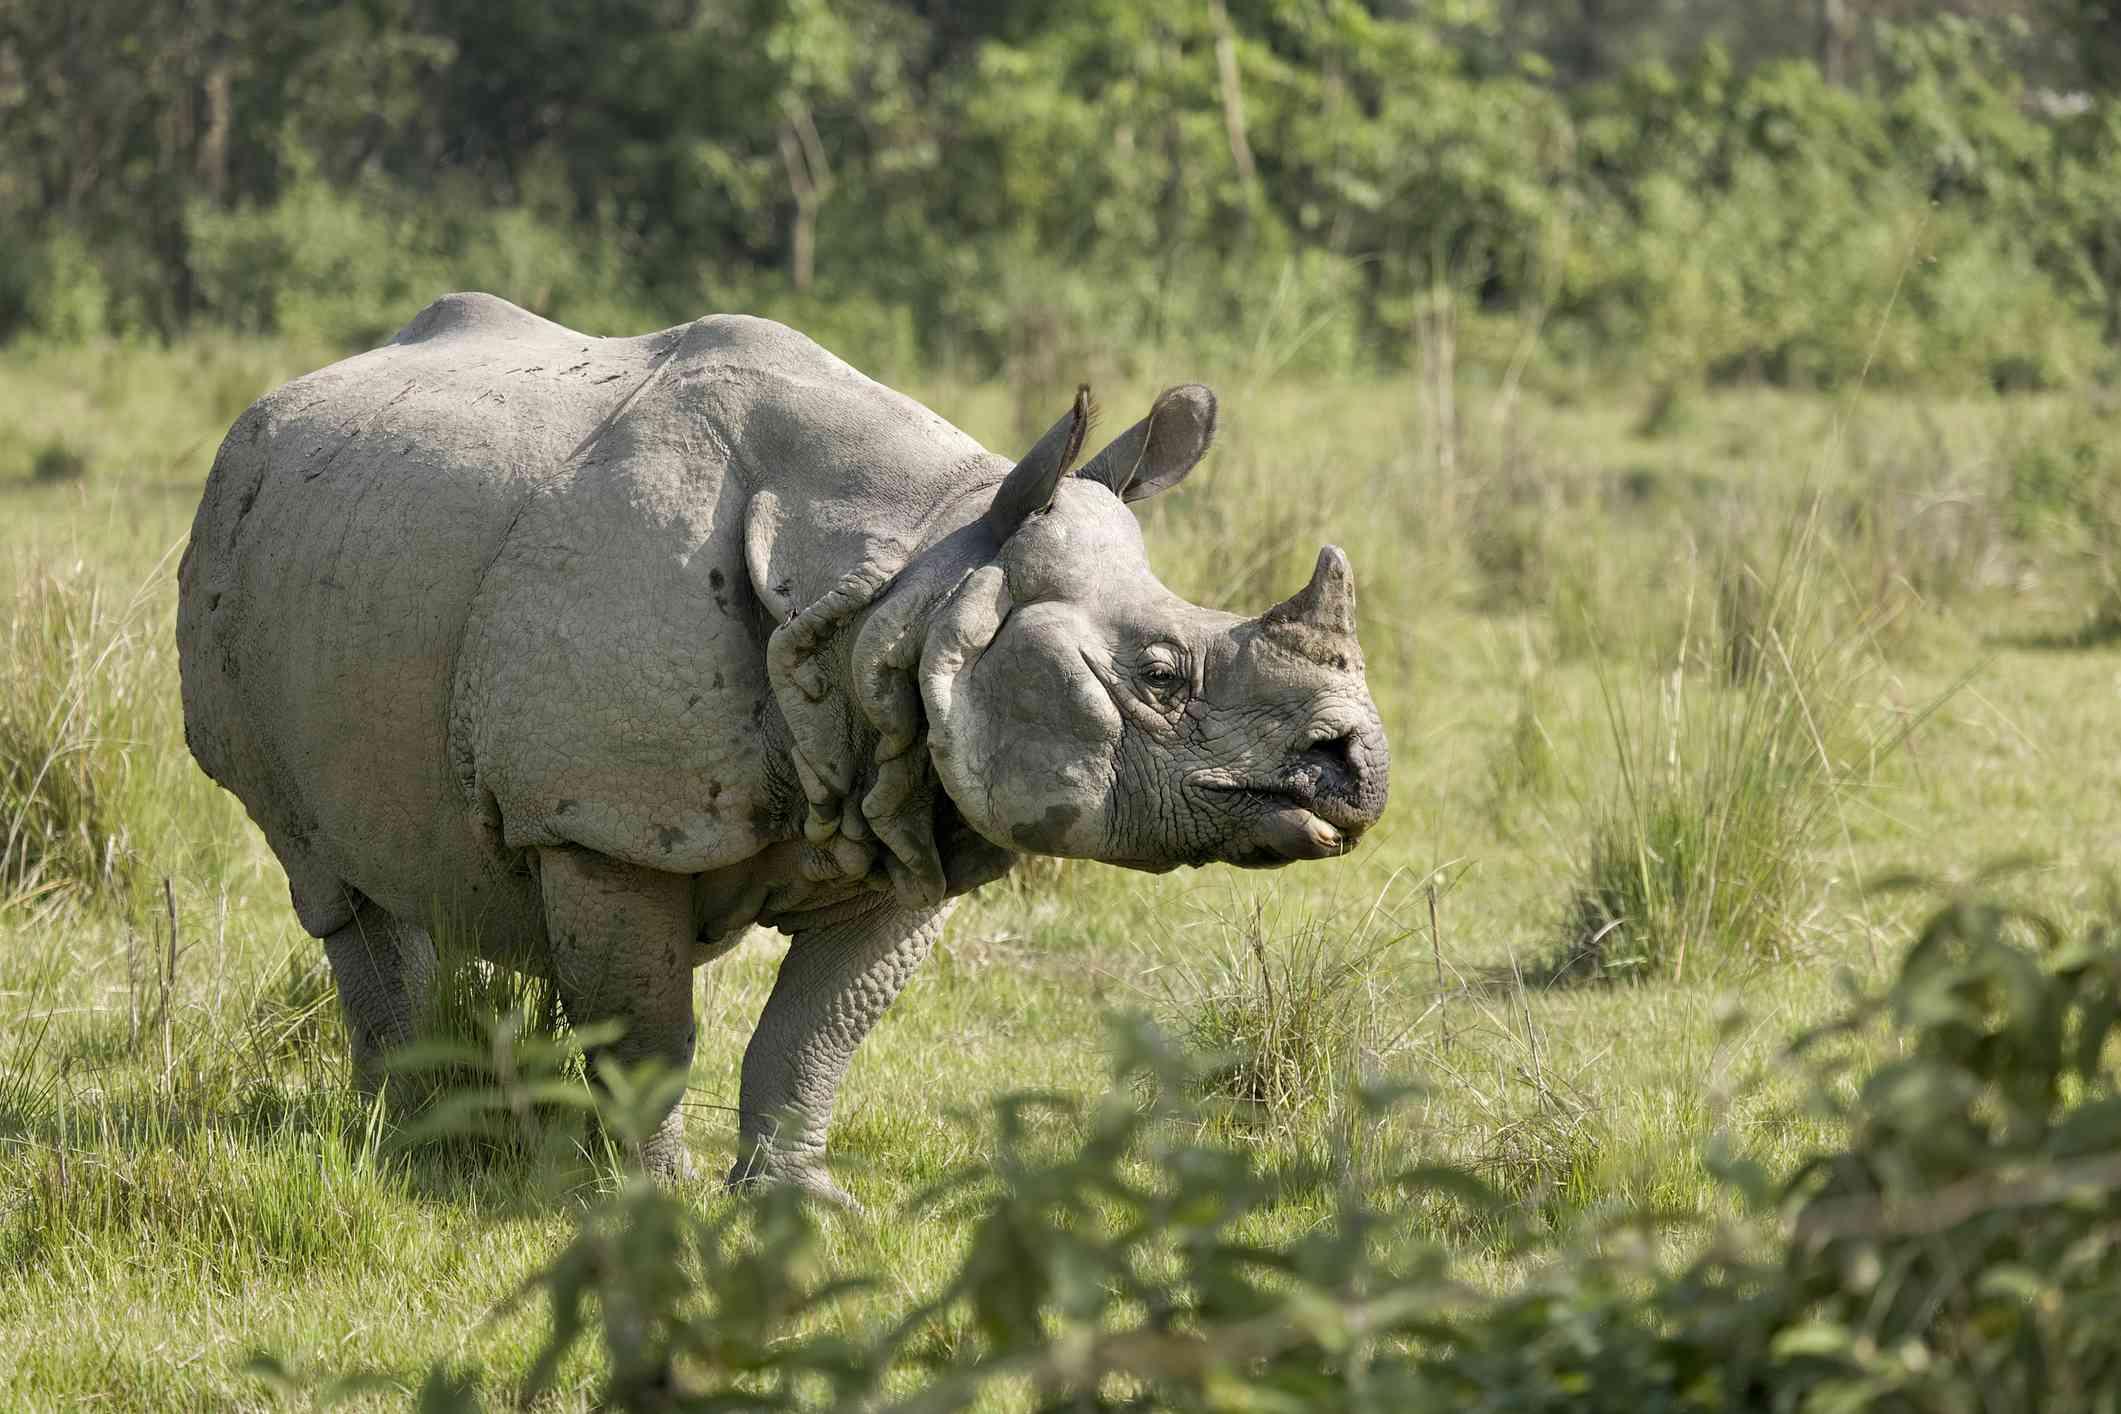 one-horned rhinoceros standing in grass